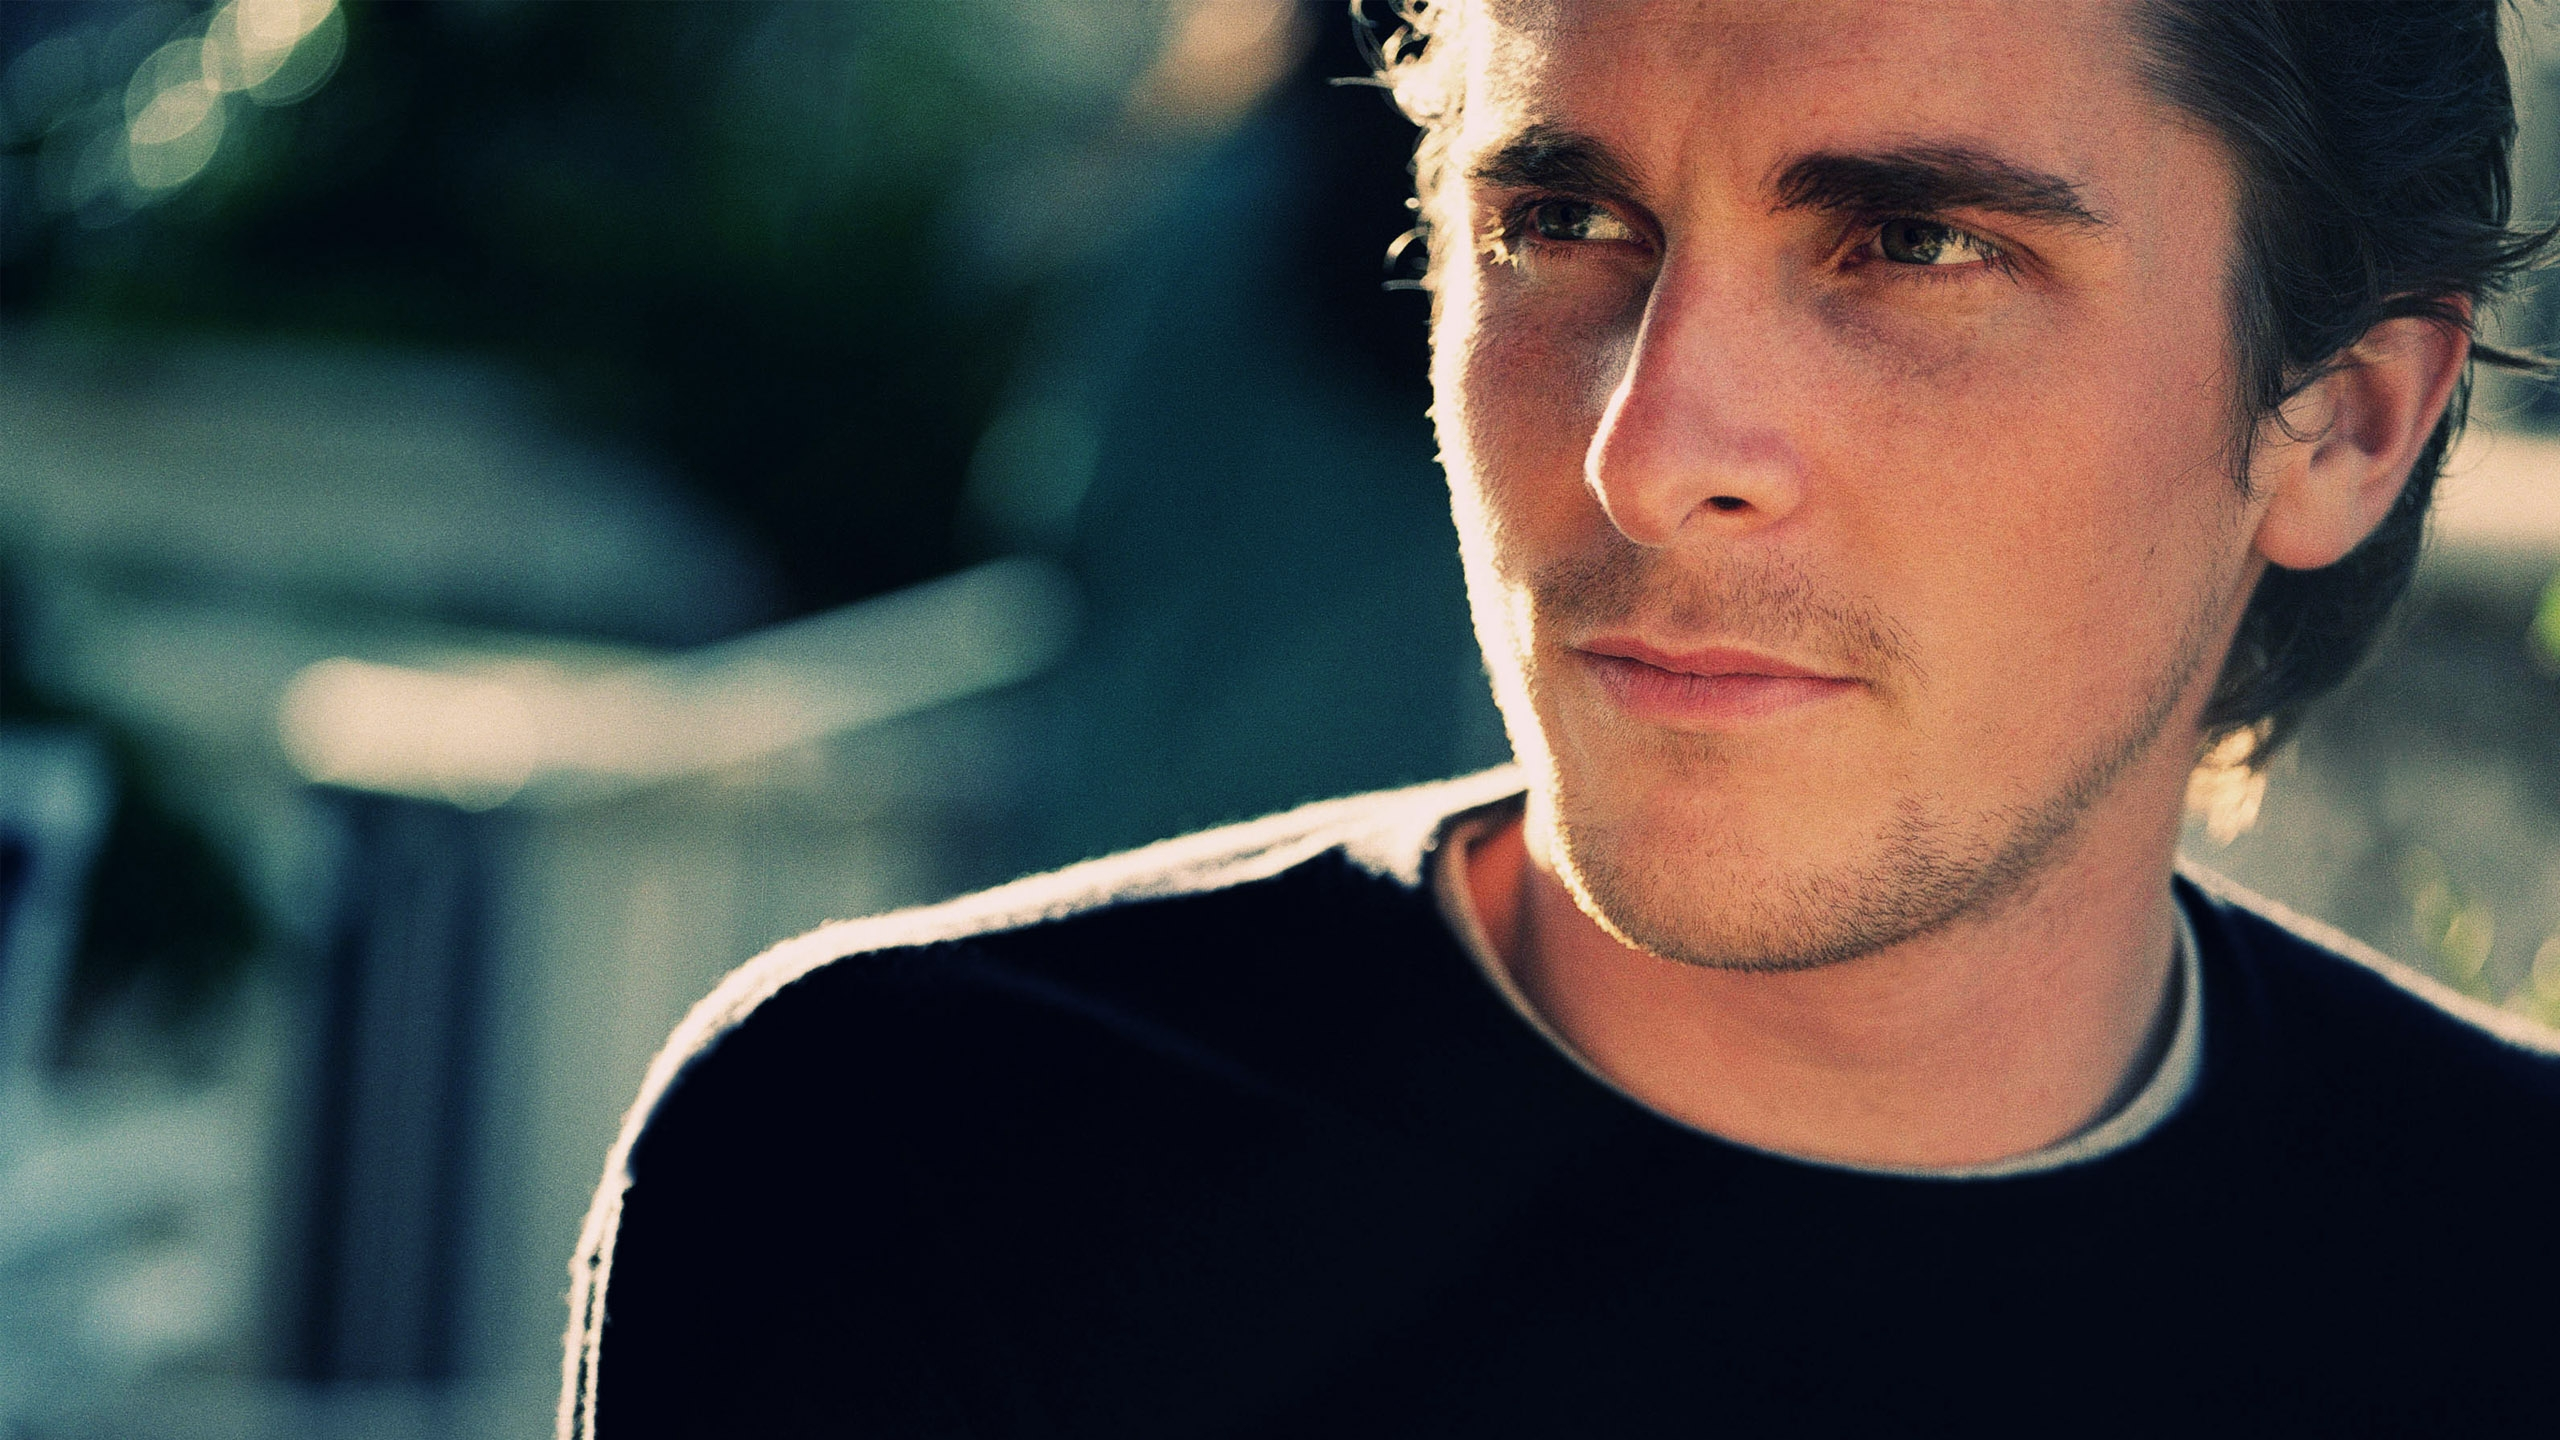 Christian Bale Wallpapers HD